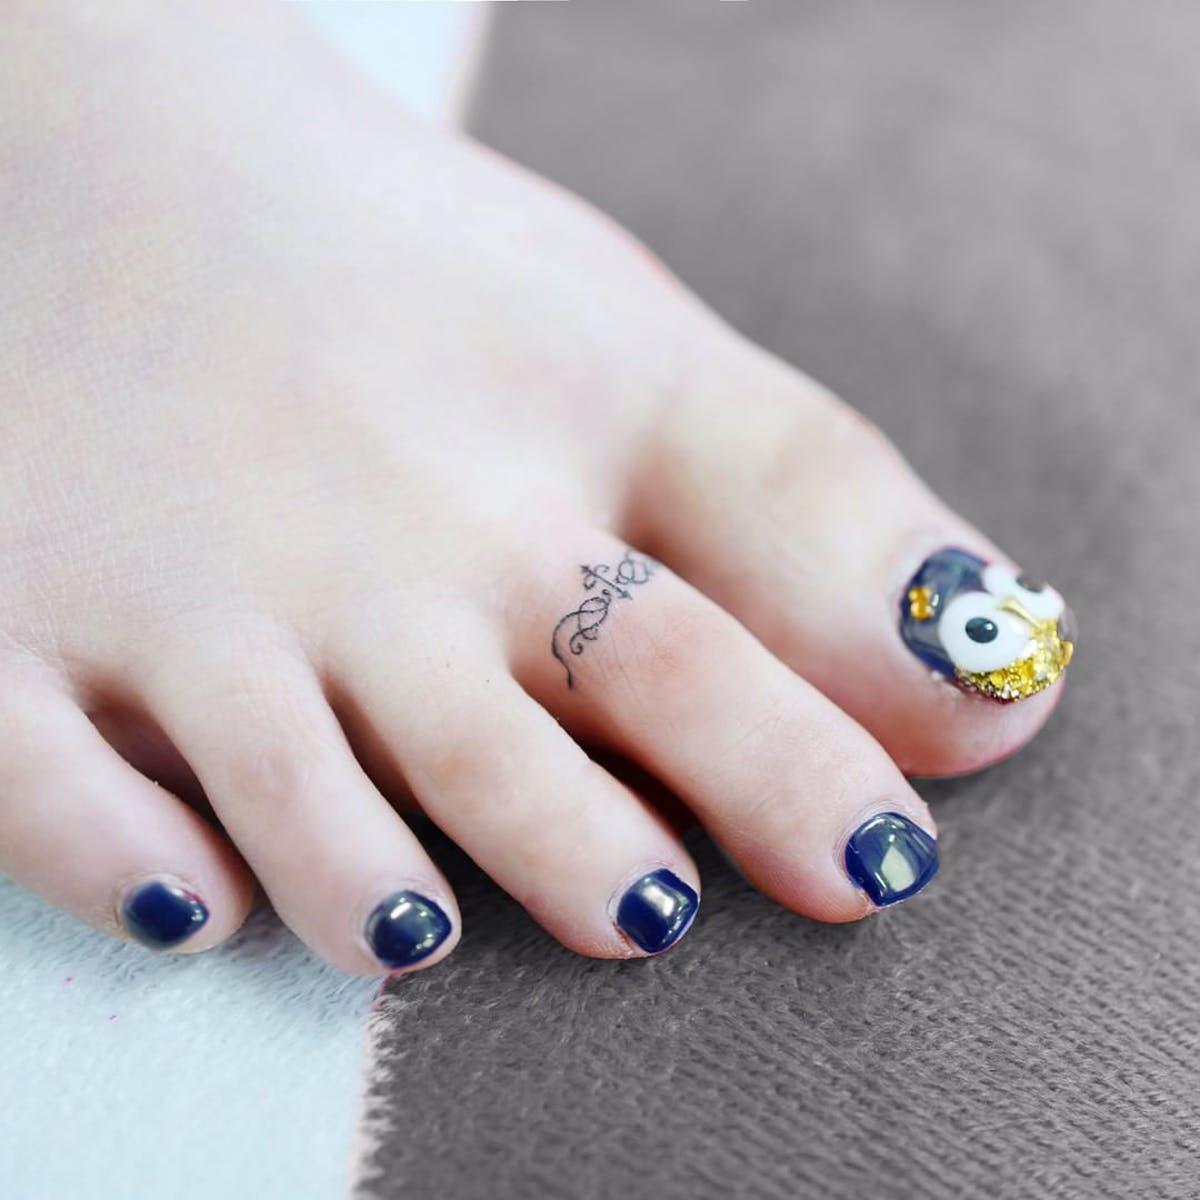 40 Small Tattoo Ideas to Copy Now | Brit + Co | Tattoo ...